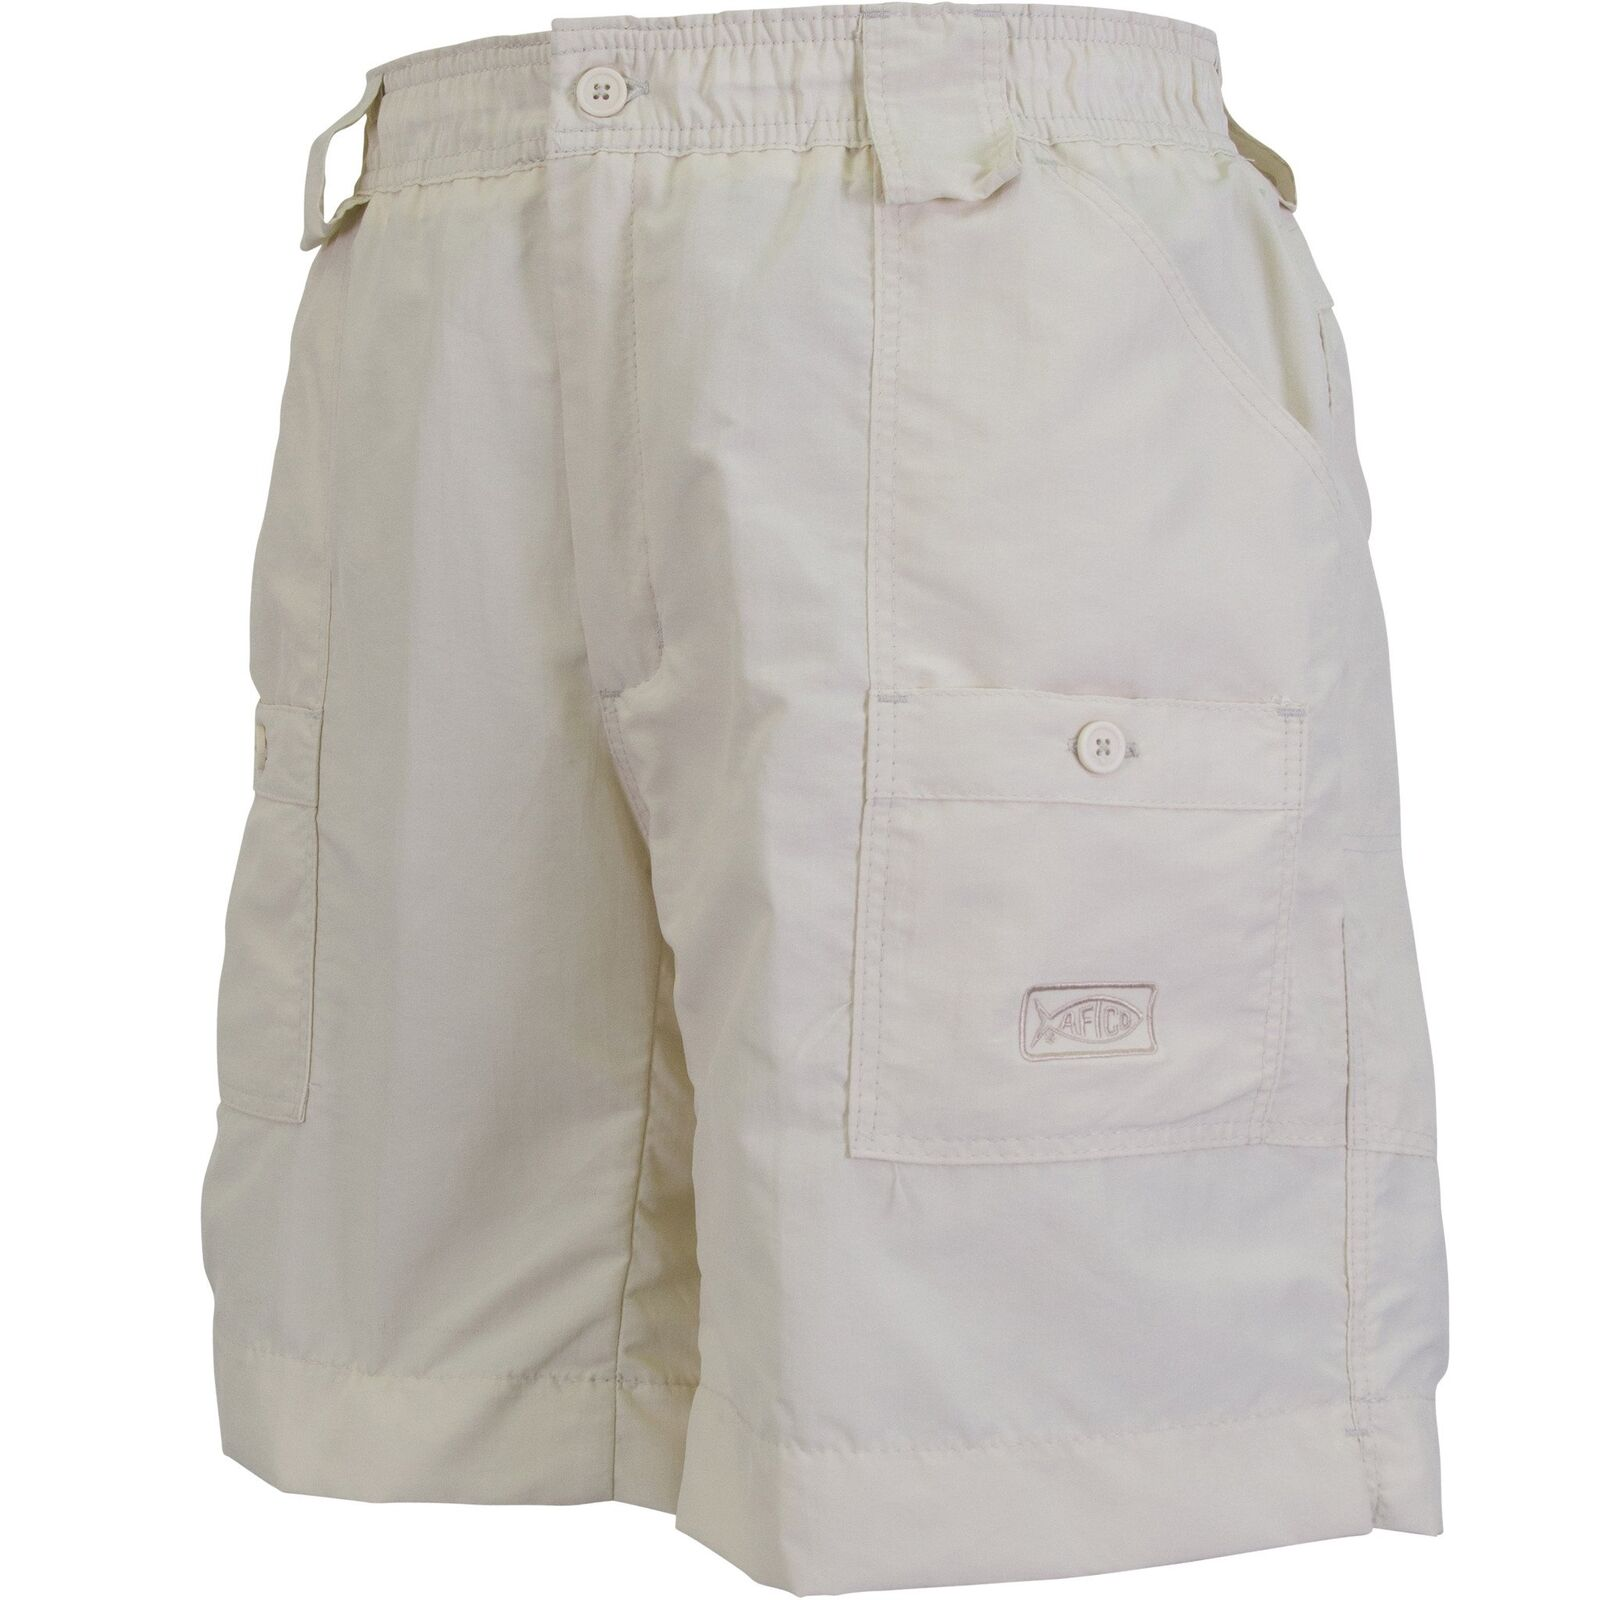 AFTCO M01L Original Long Fishing Shorts - 18